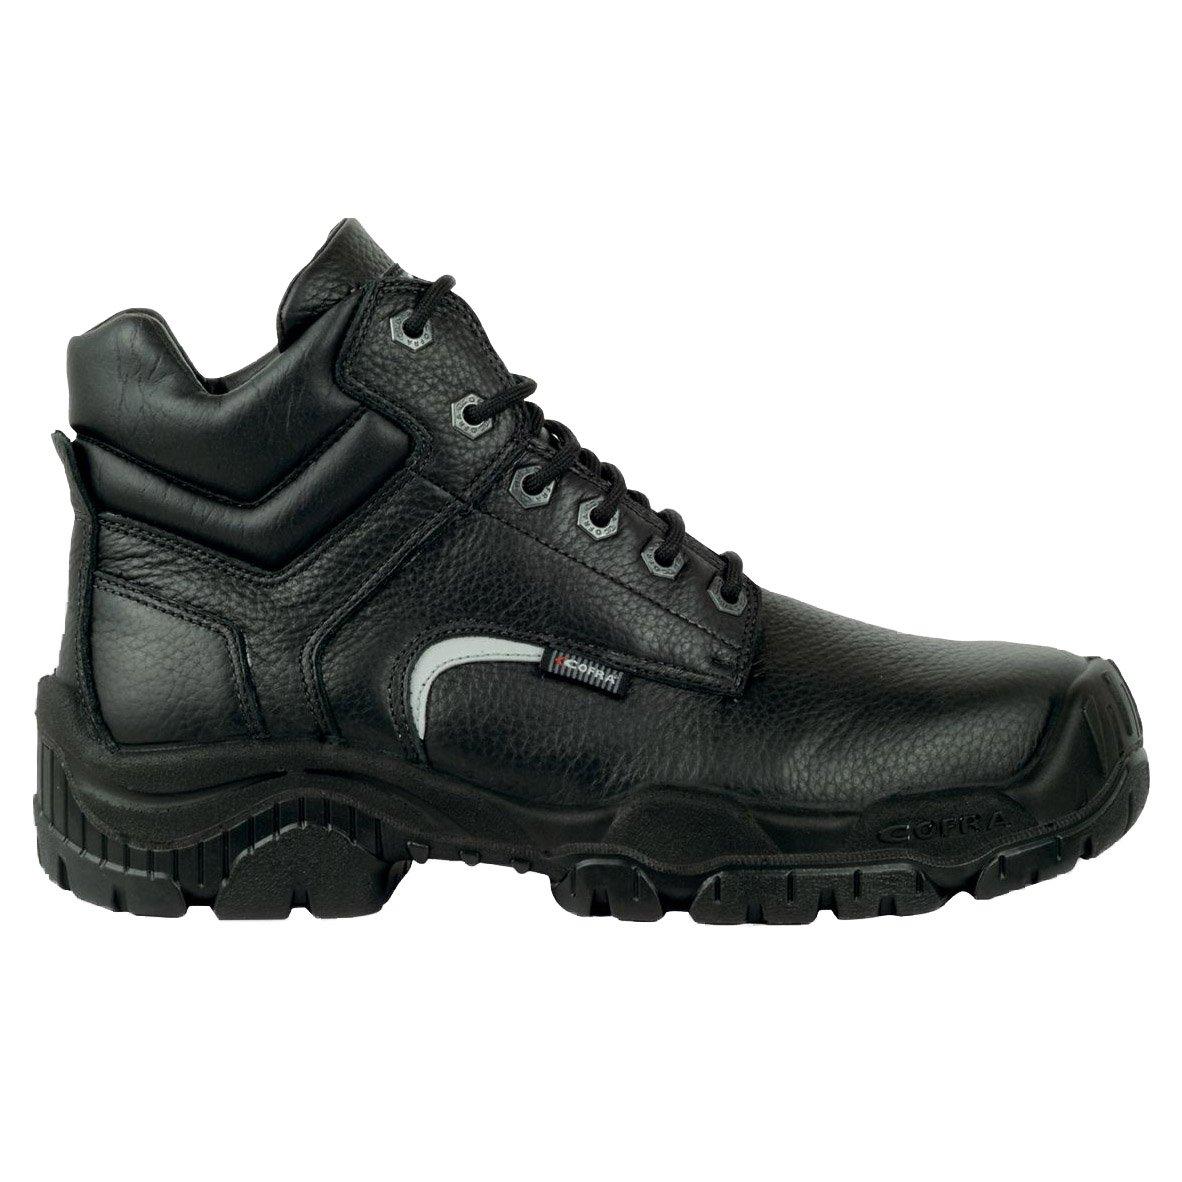 Cofra 31091–000.w40 Gr. Gr. Gr. 40 S3 CI SRC Luton Sicherheit Schuhe – Schwarz - 20e3ab